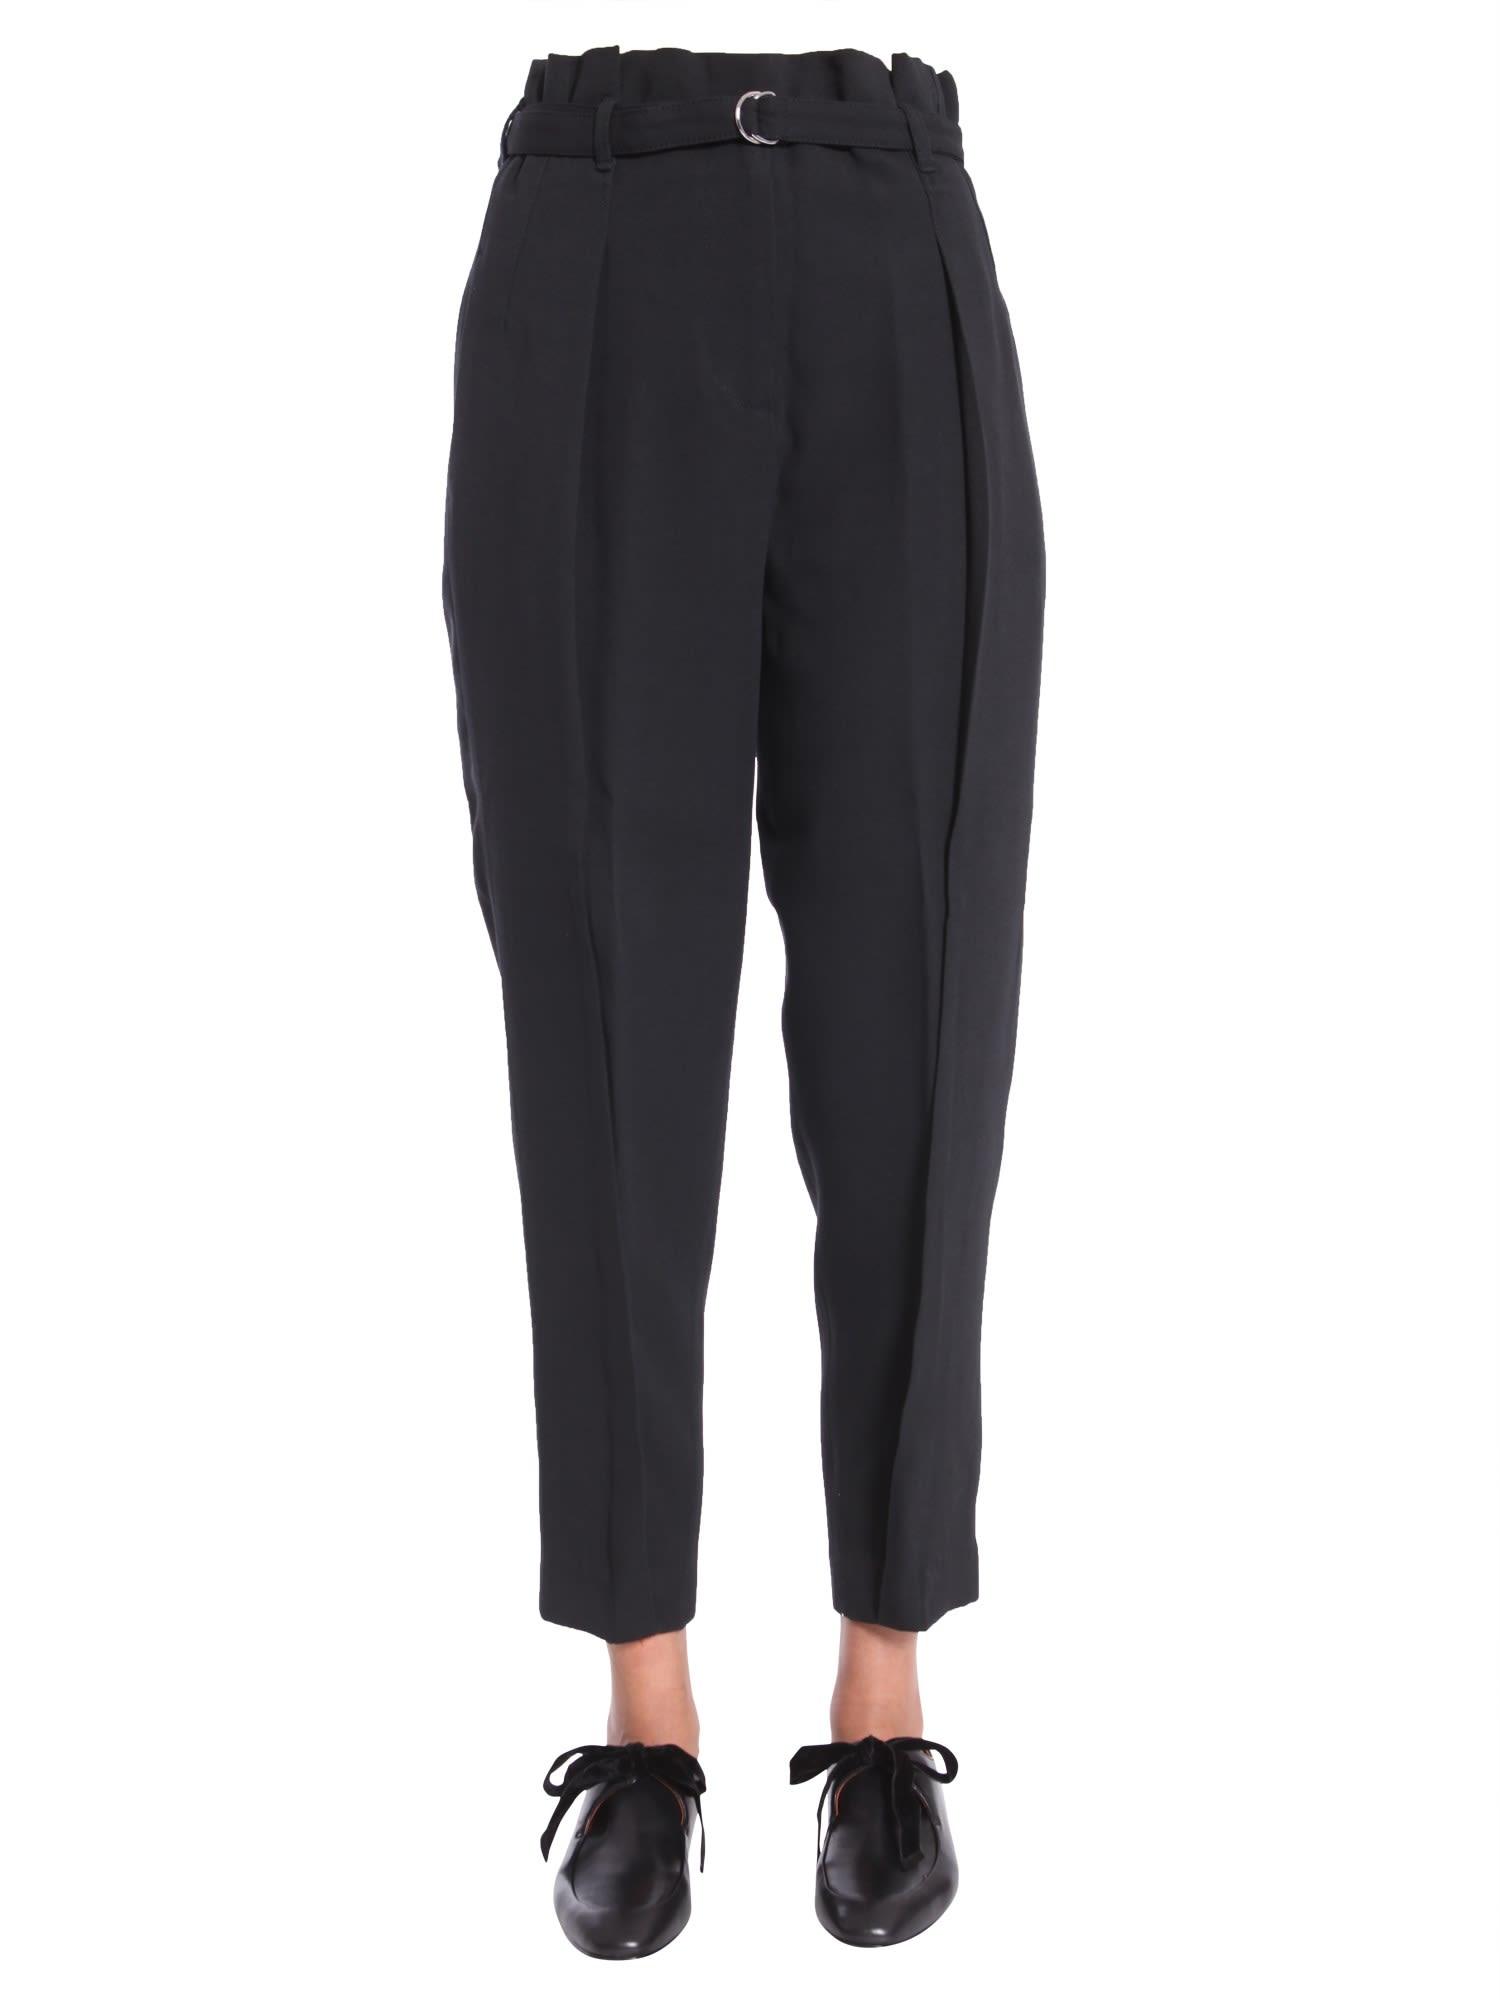 High Waist Trousers